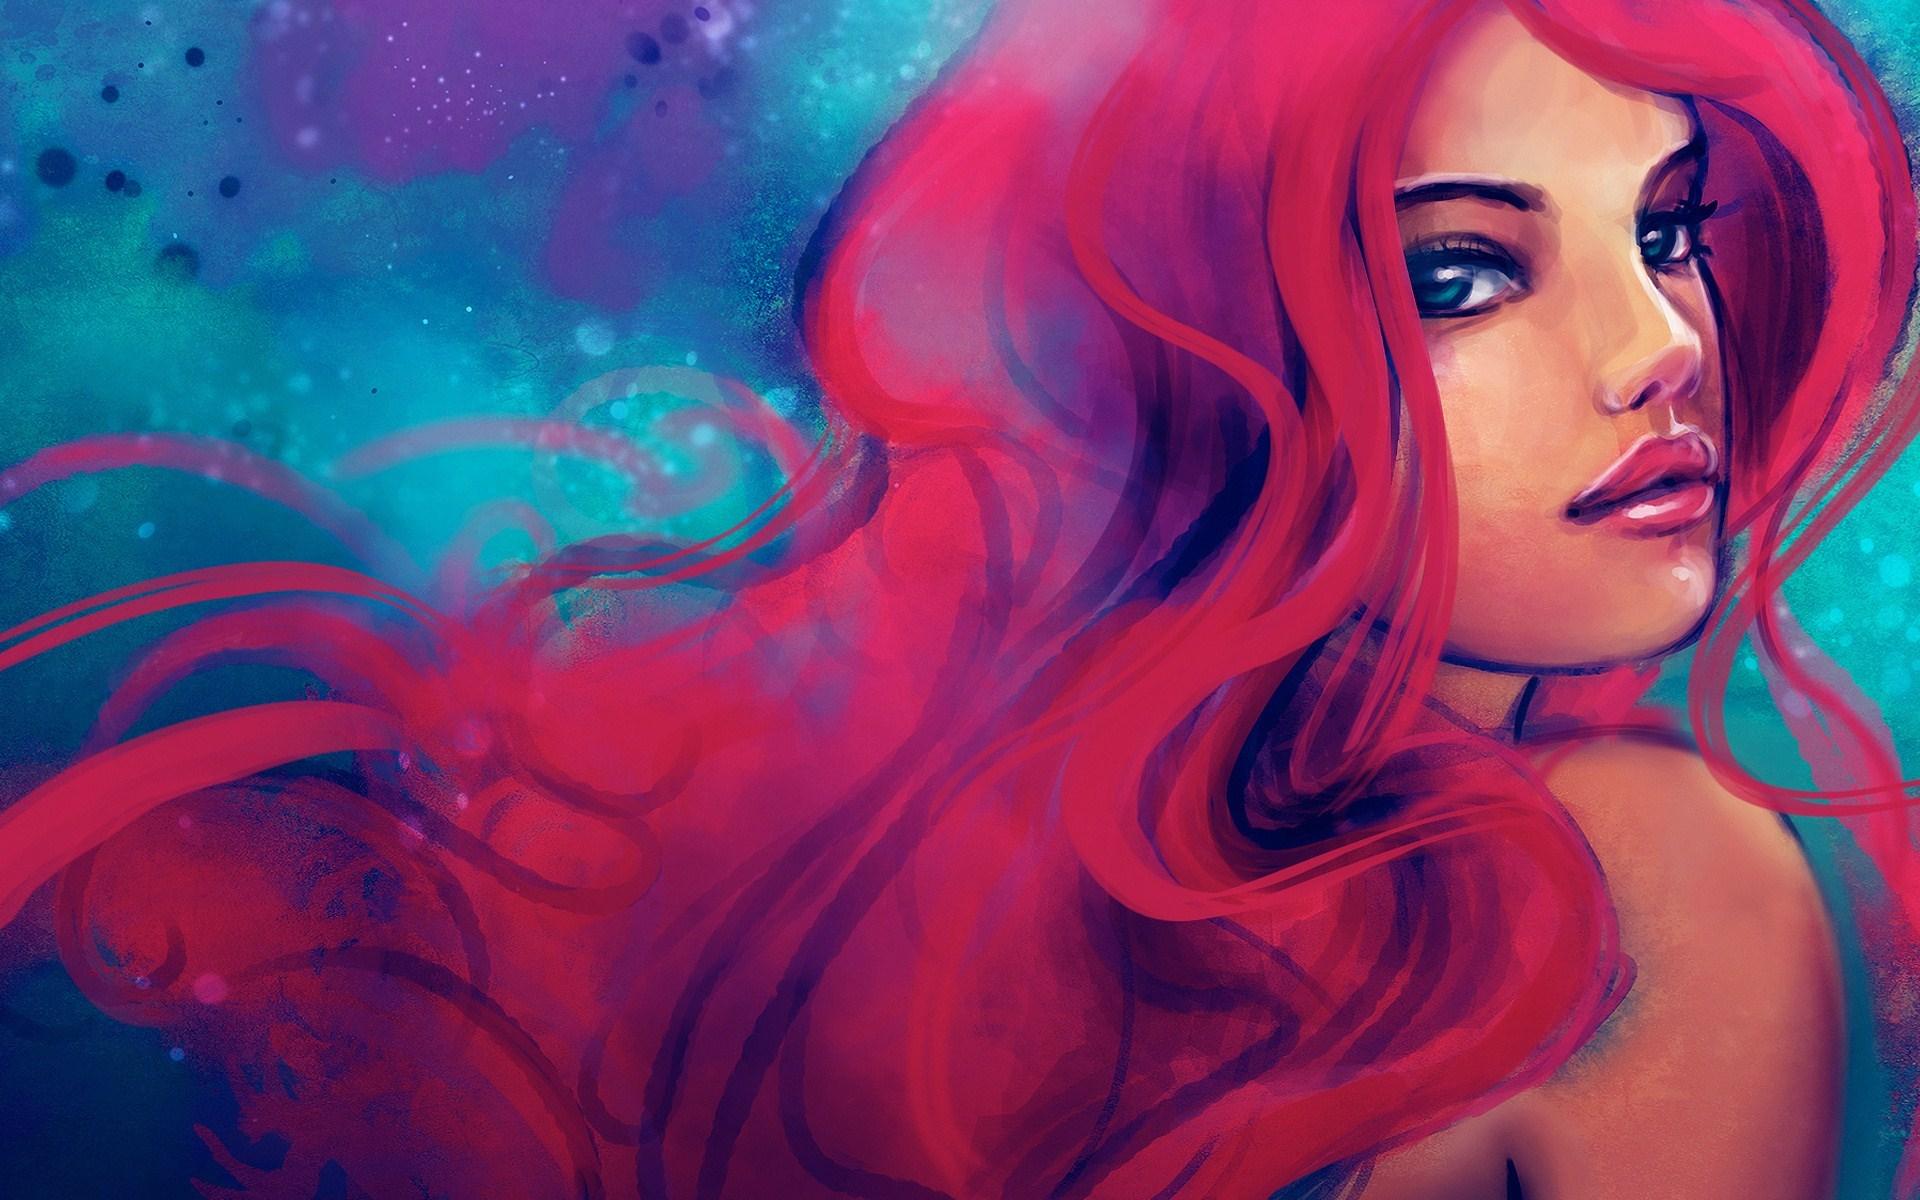 Art Girl Redhead Painting